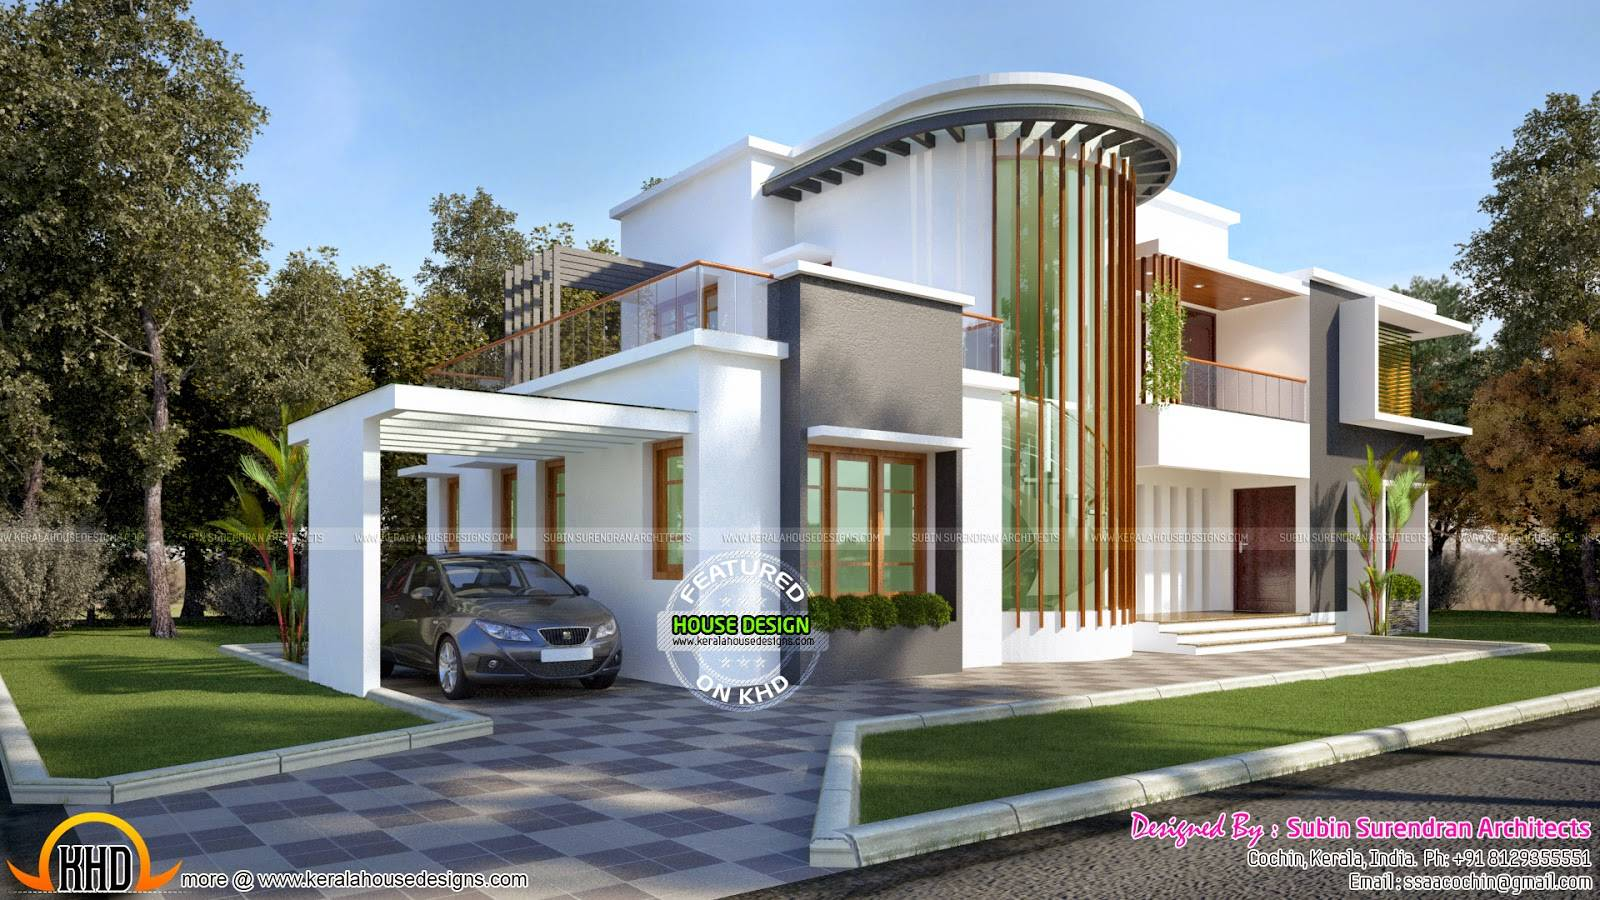 17 Fantastic Modern Villa Floor Plans That Make You Swoon House Plans